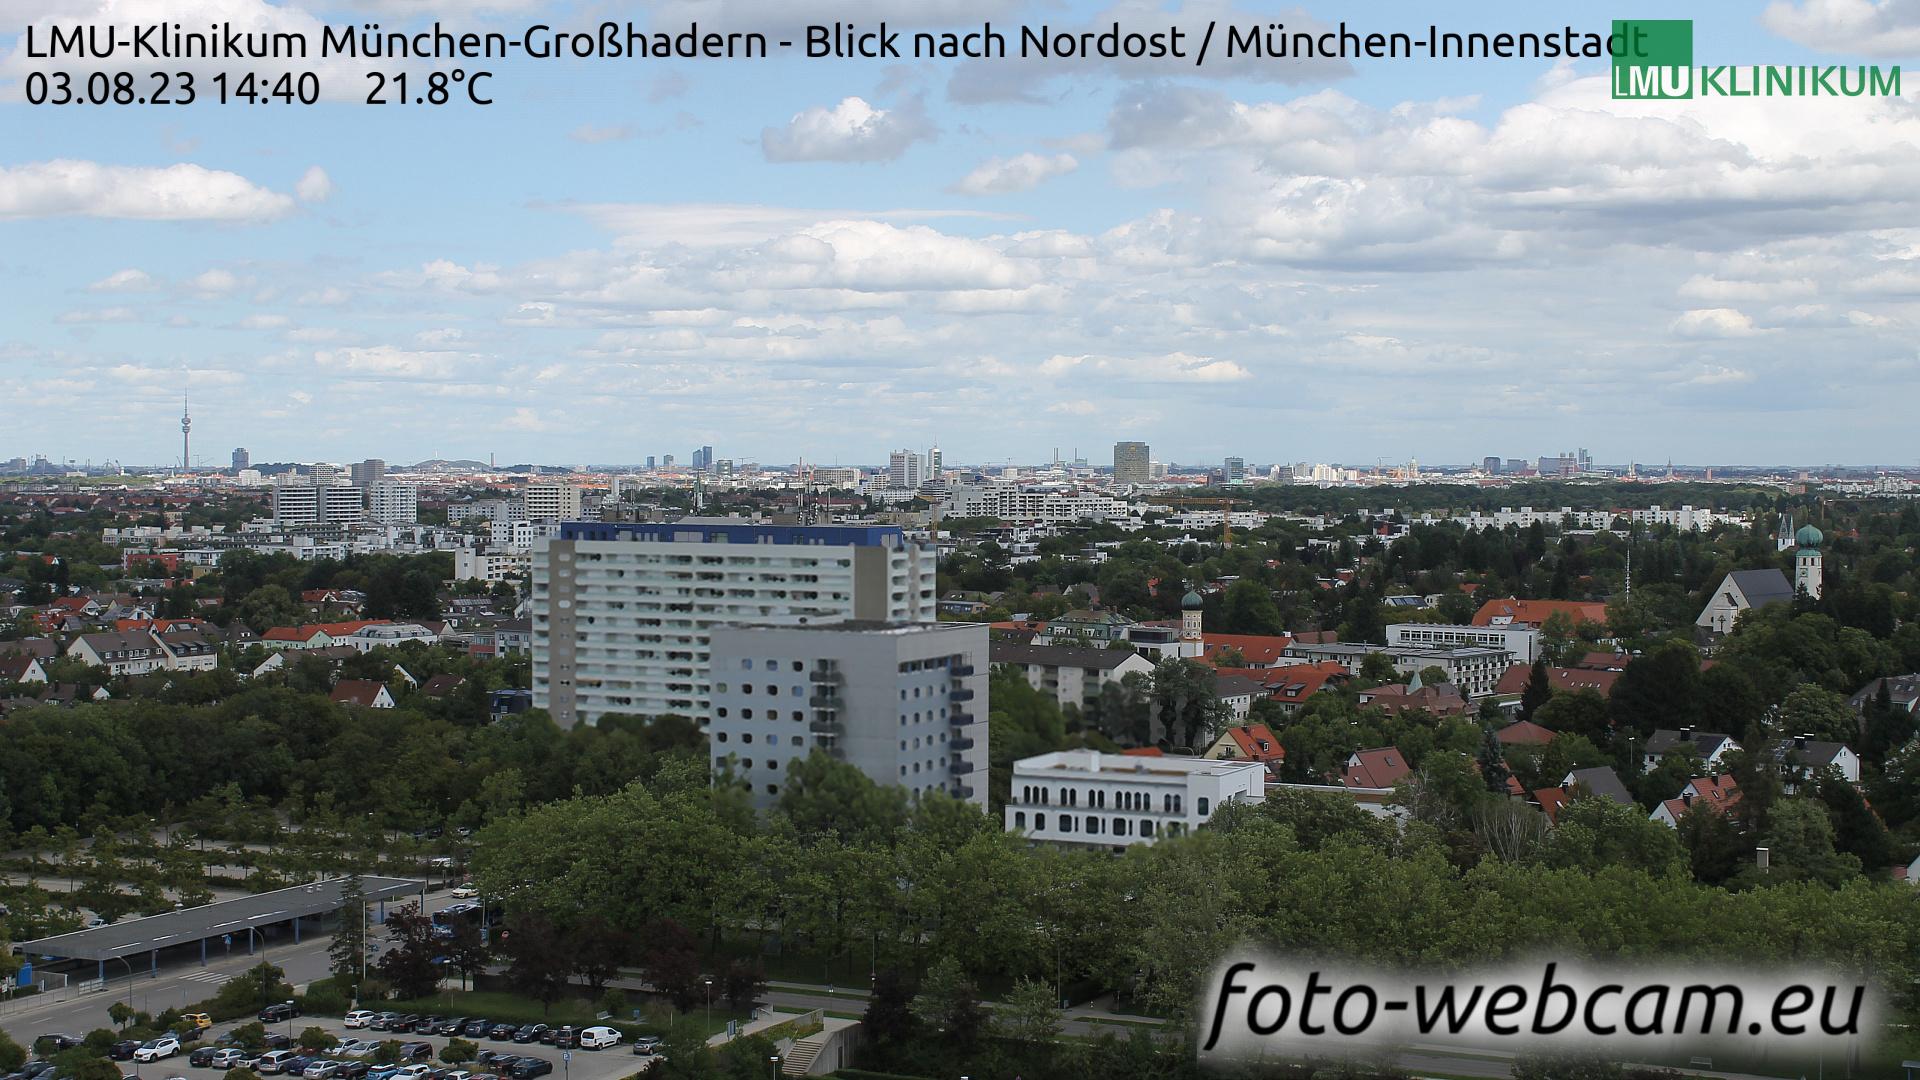 Munich Mon. 14:47